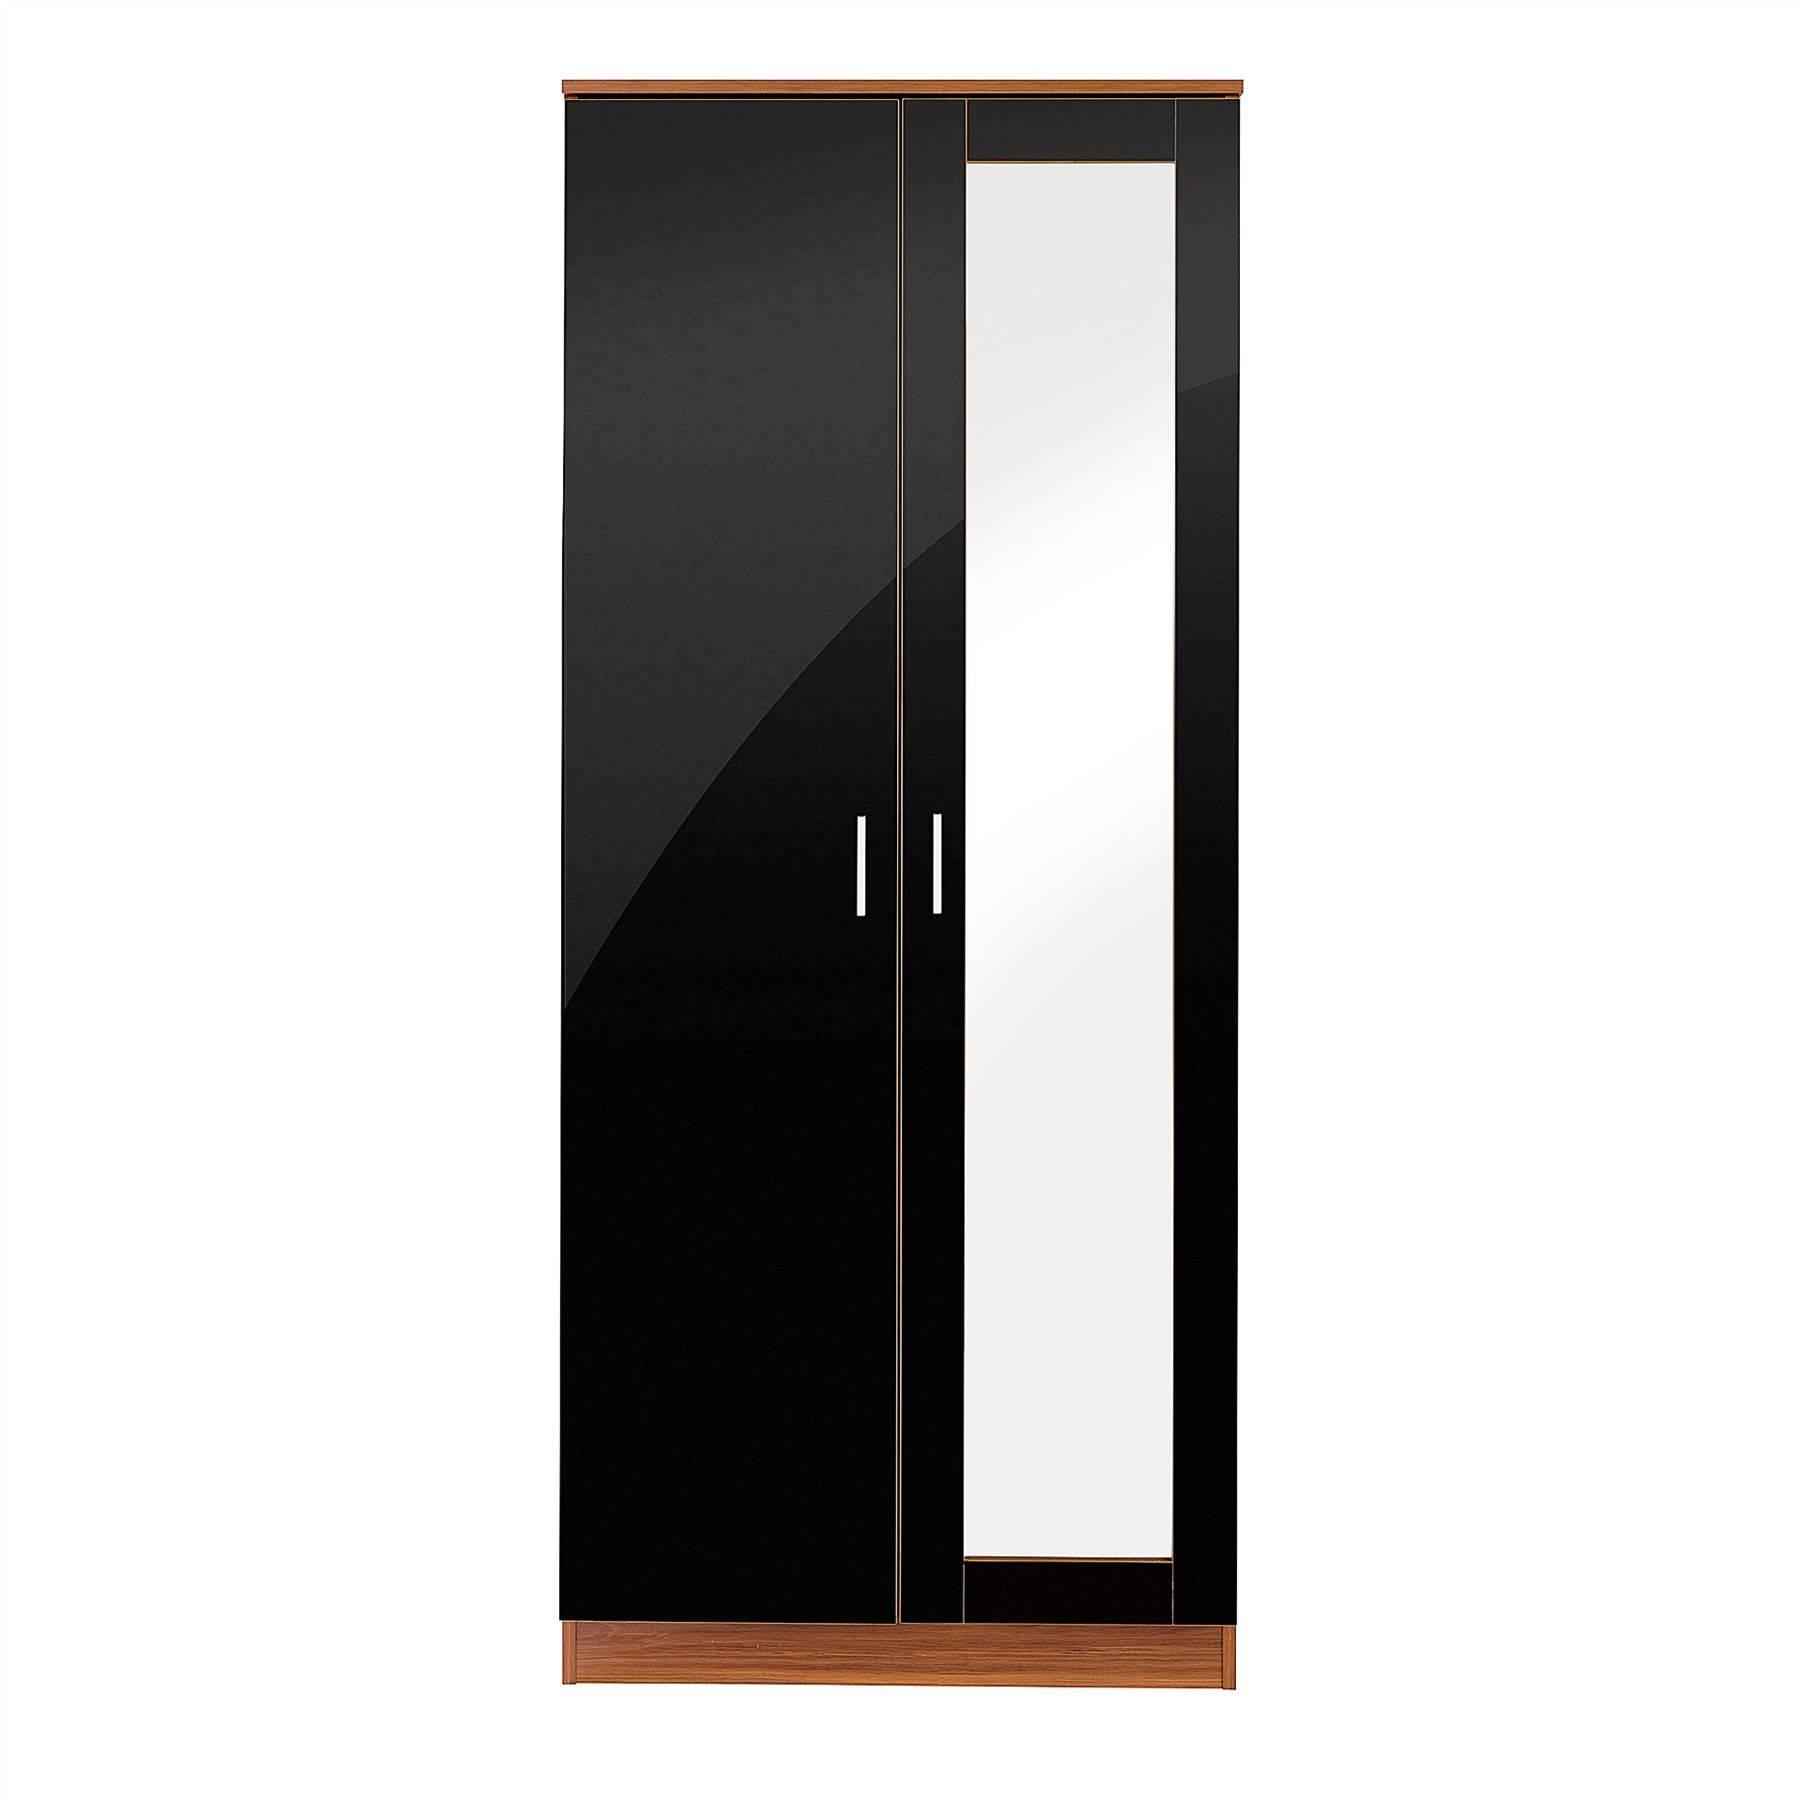 Bedroom Furniture 3 Piece Set Black Gloss & Walnut Wardrobe throughout Black Gloss Wardrobes (Image 2 of 15)